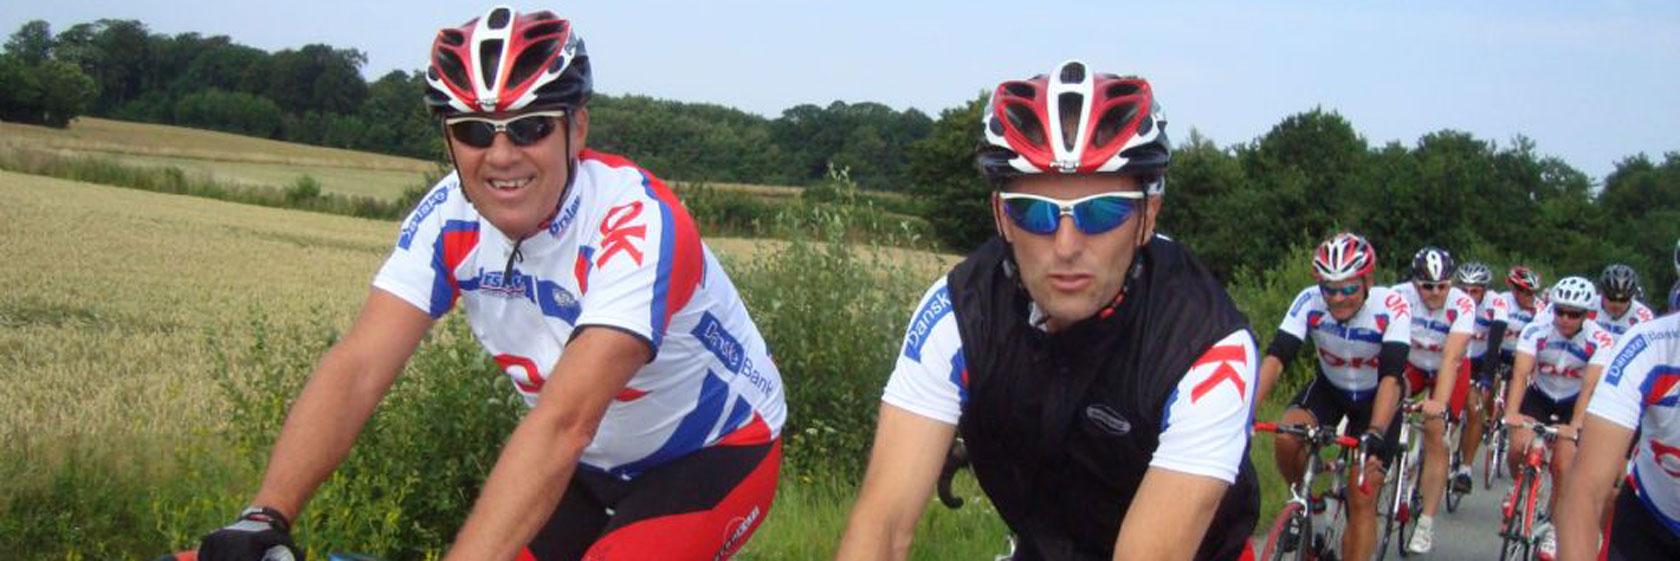 Cykelinstruktører